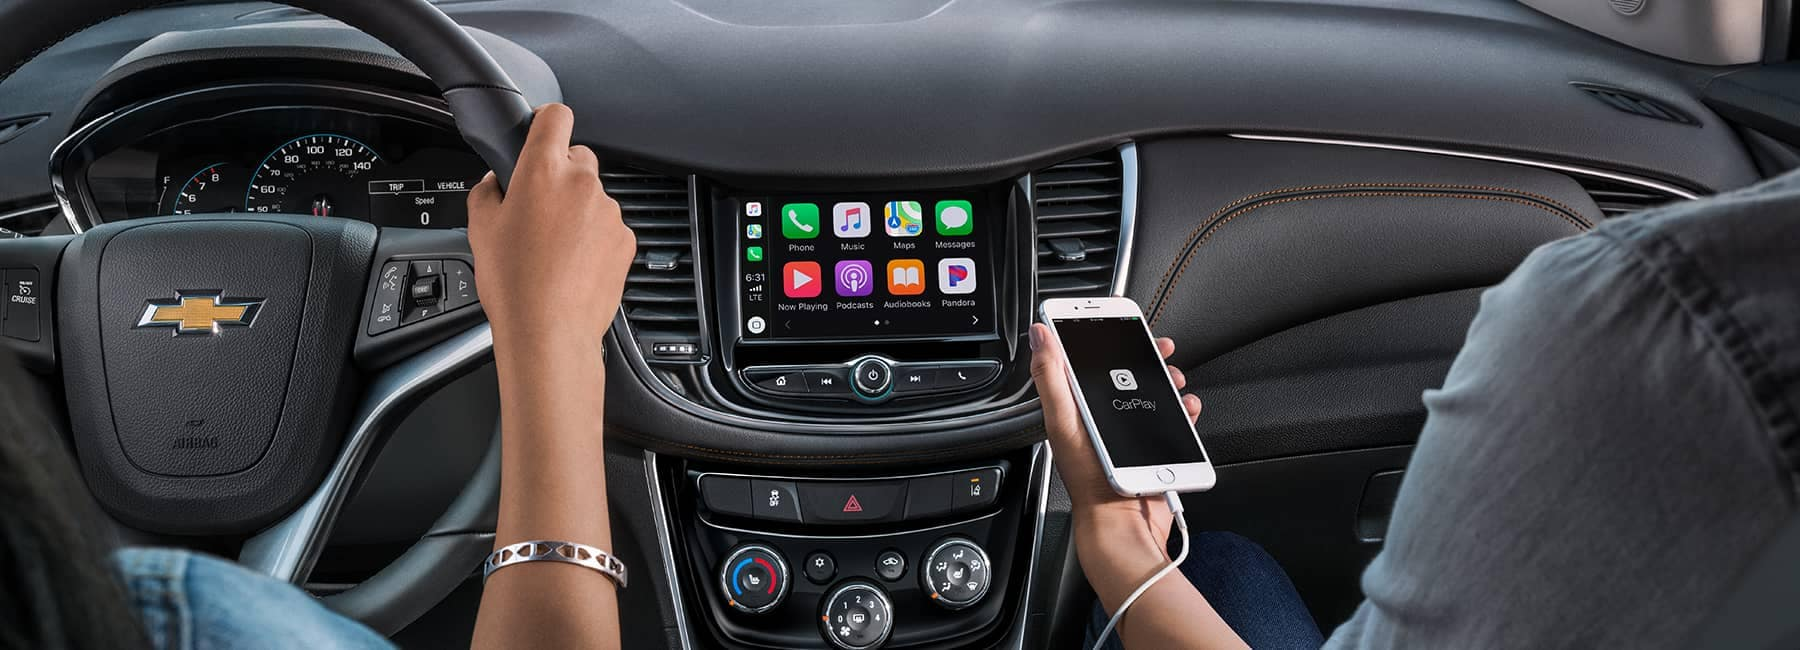 2020 Chevrolet Trax Interior Dashboard, person using cellphone